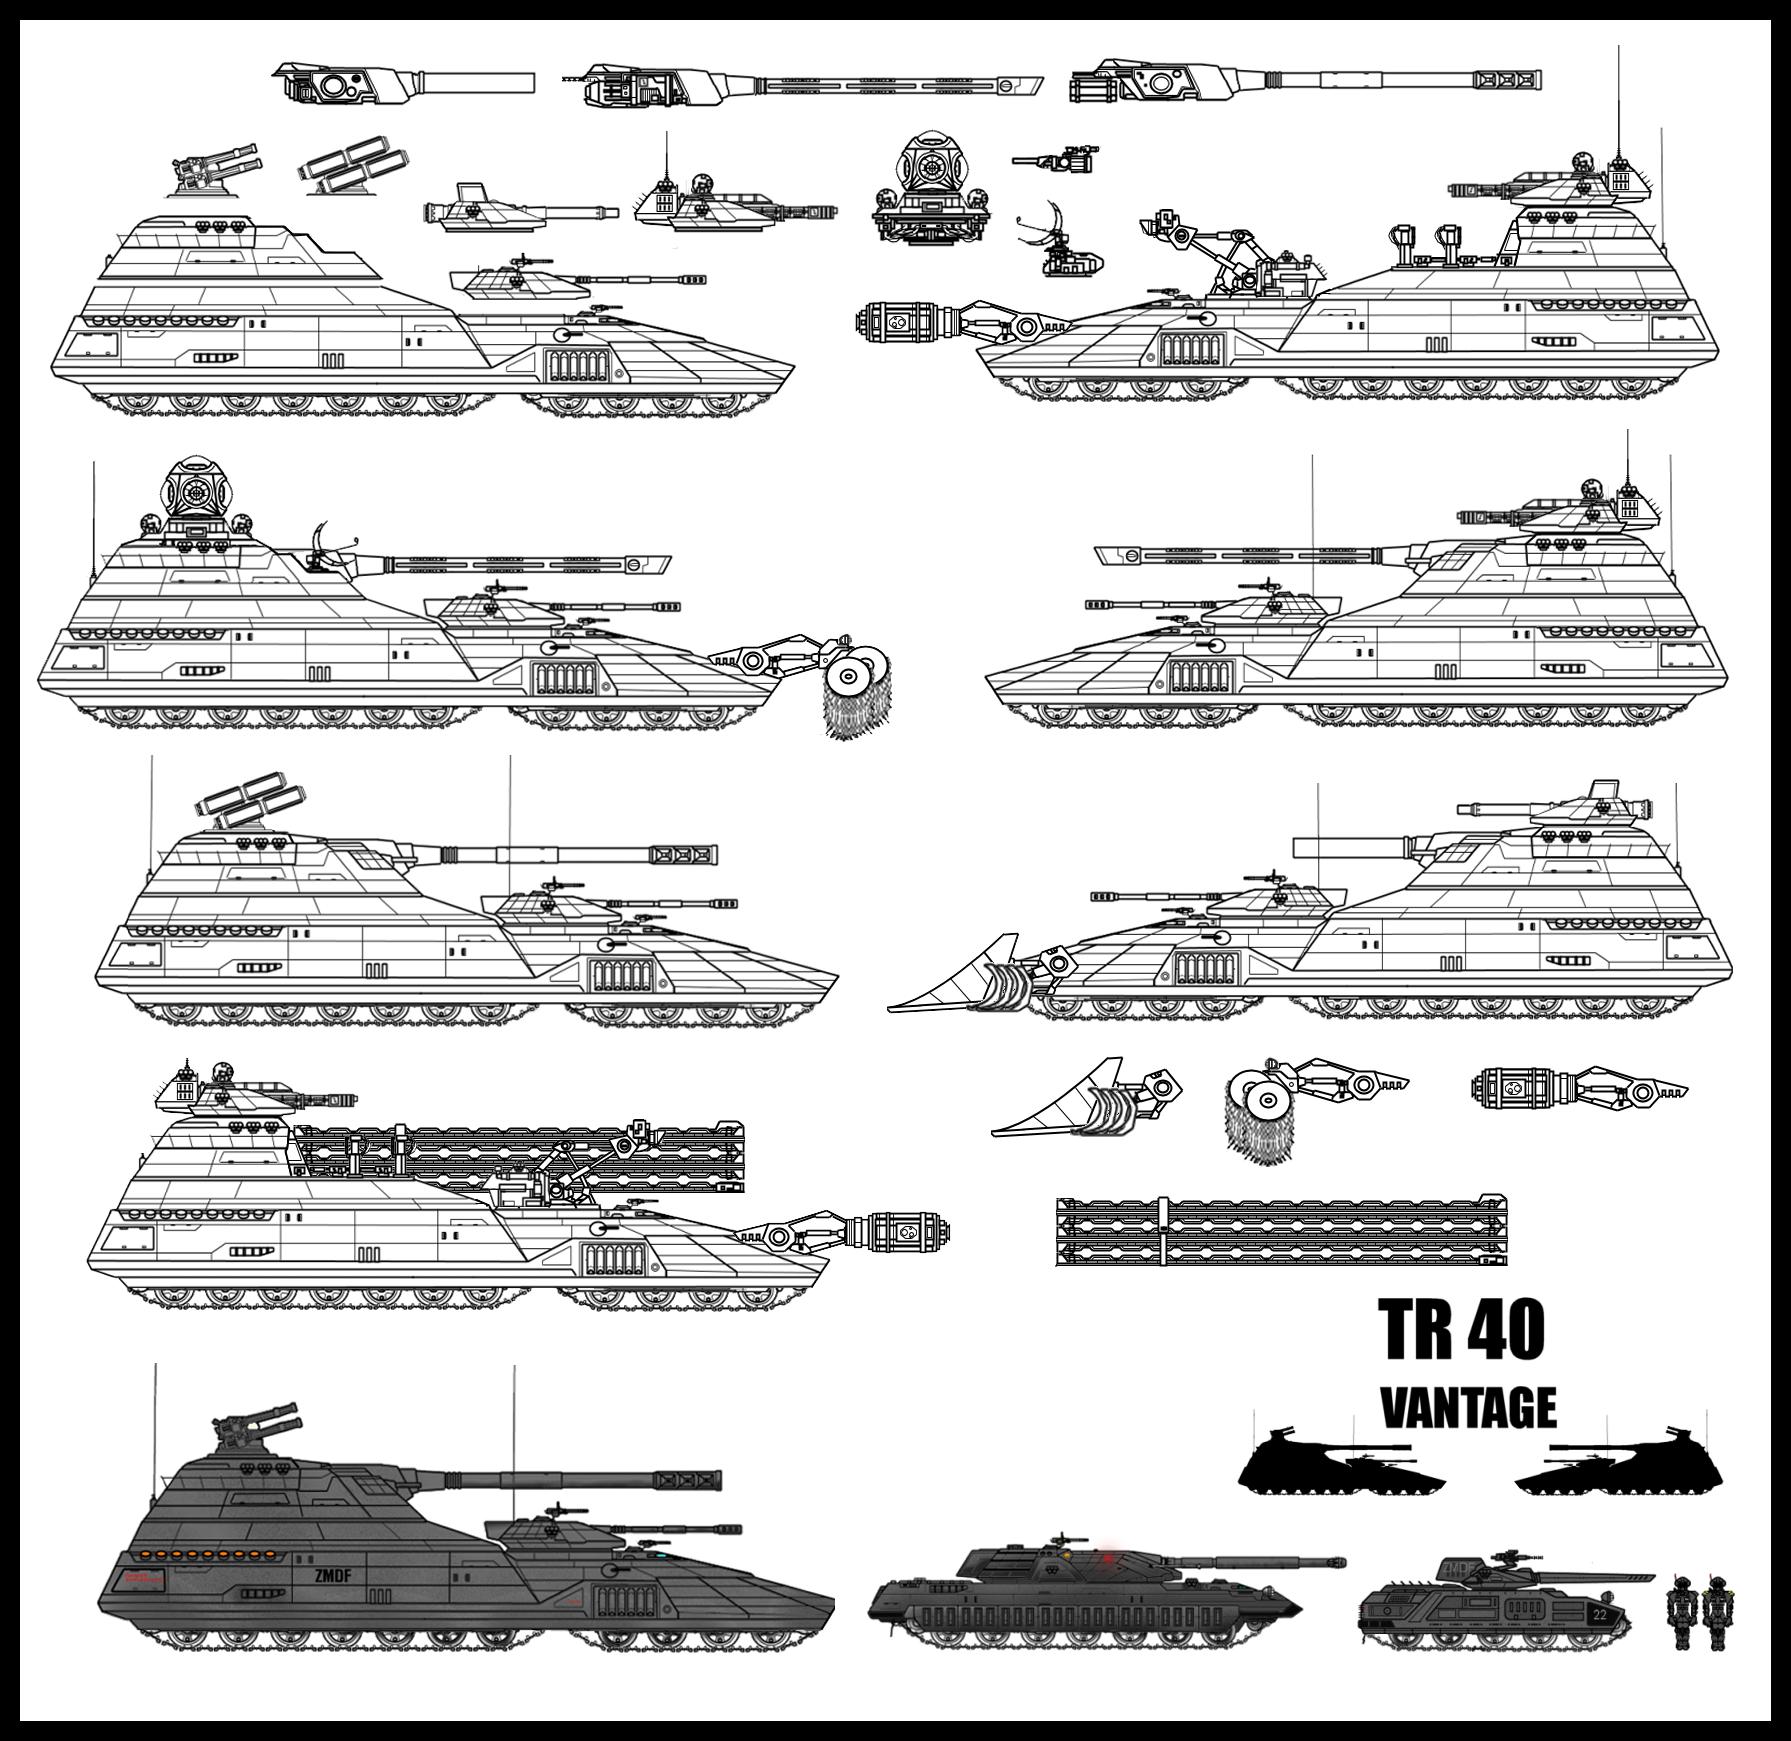 TR40 Vantage Update by Evilonavich